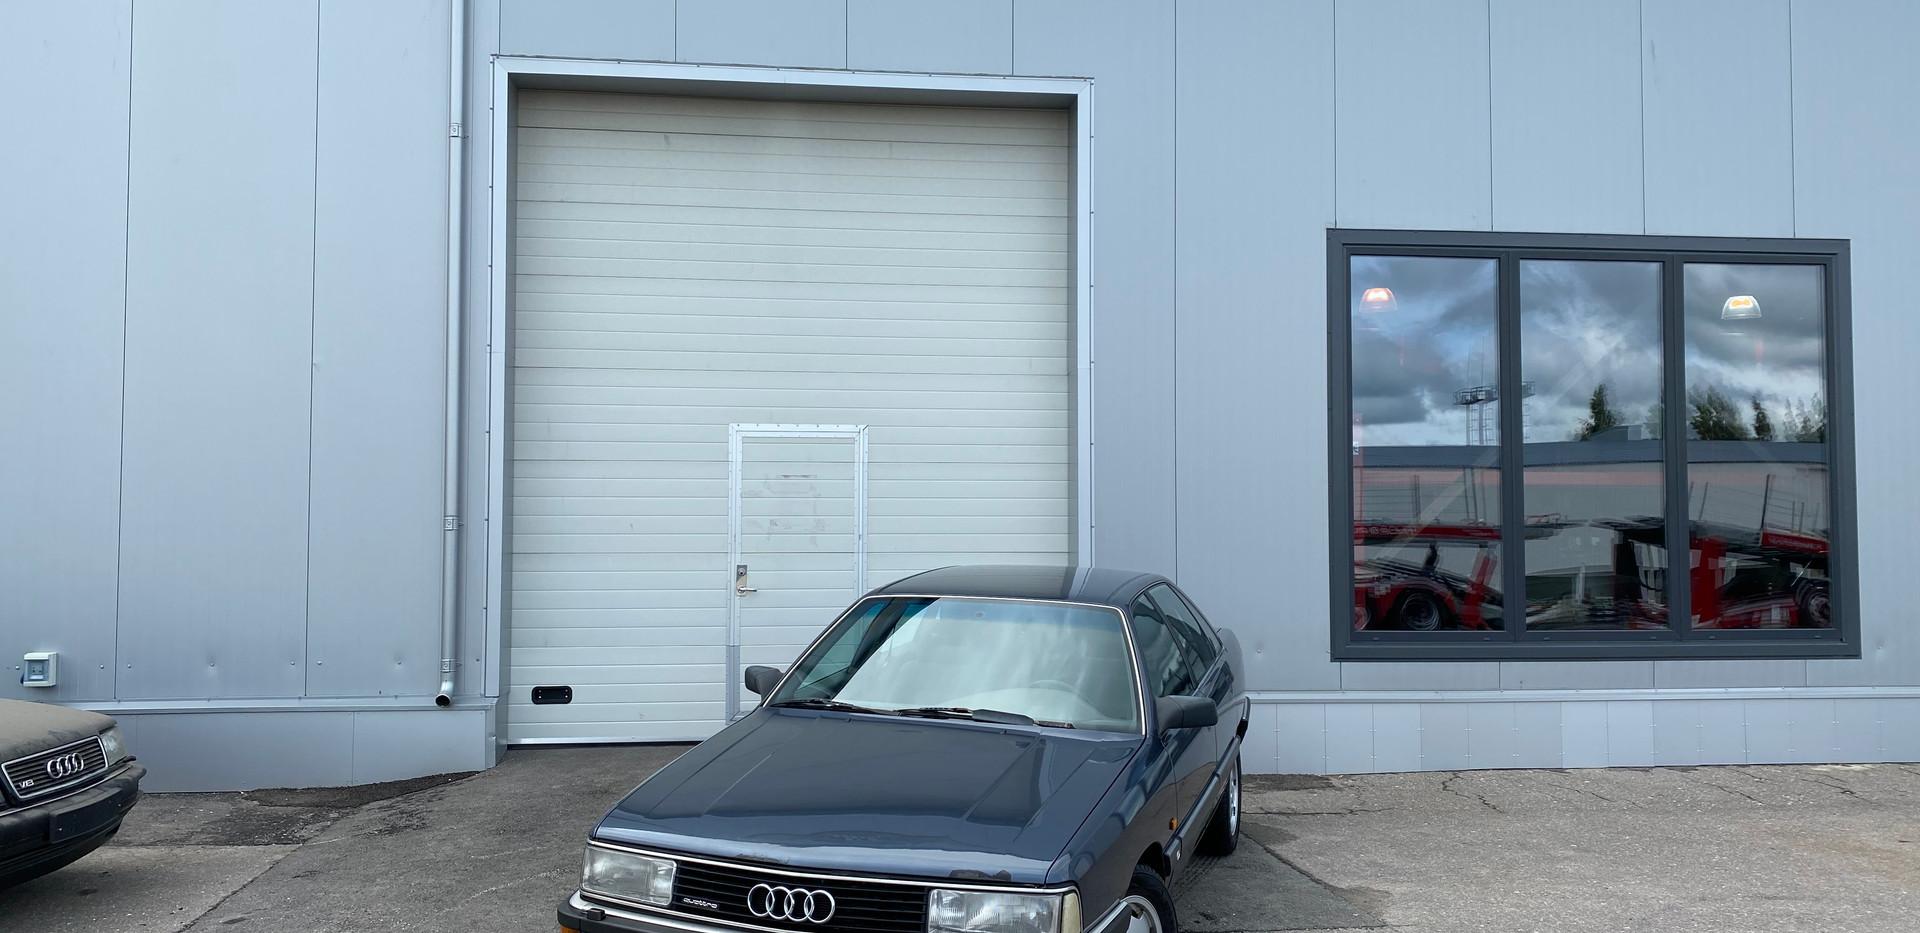 Audi 200 1989